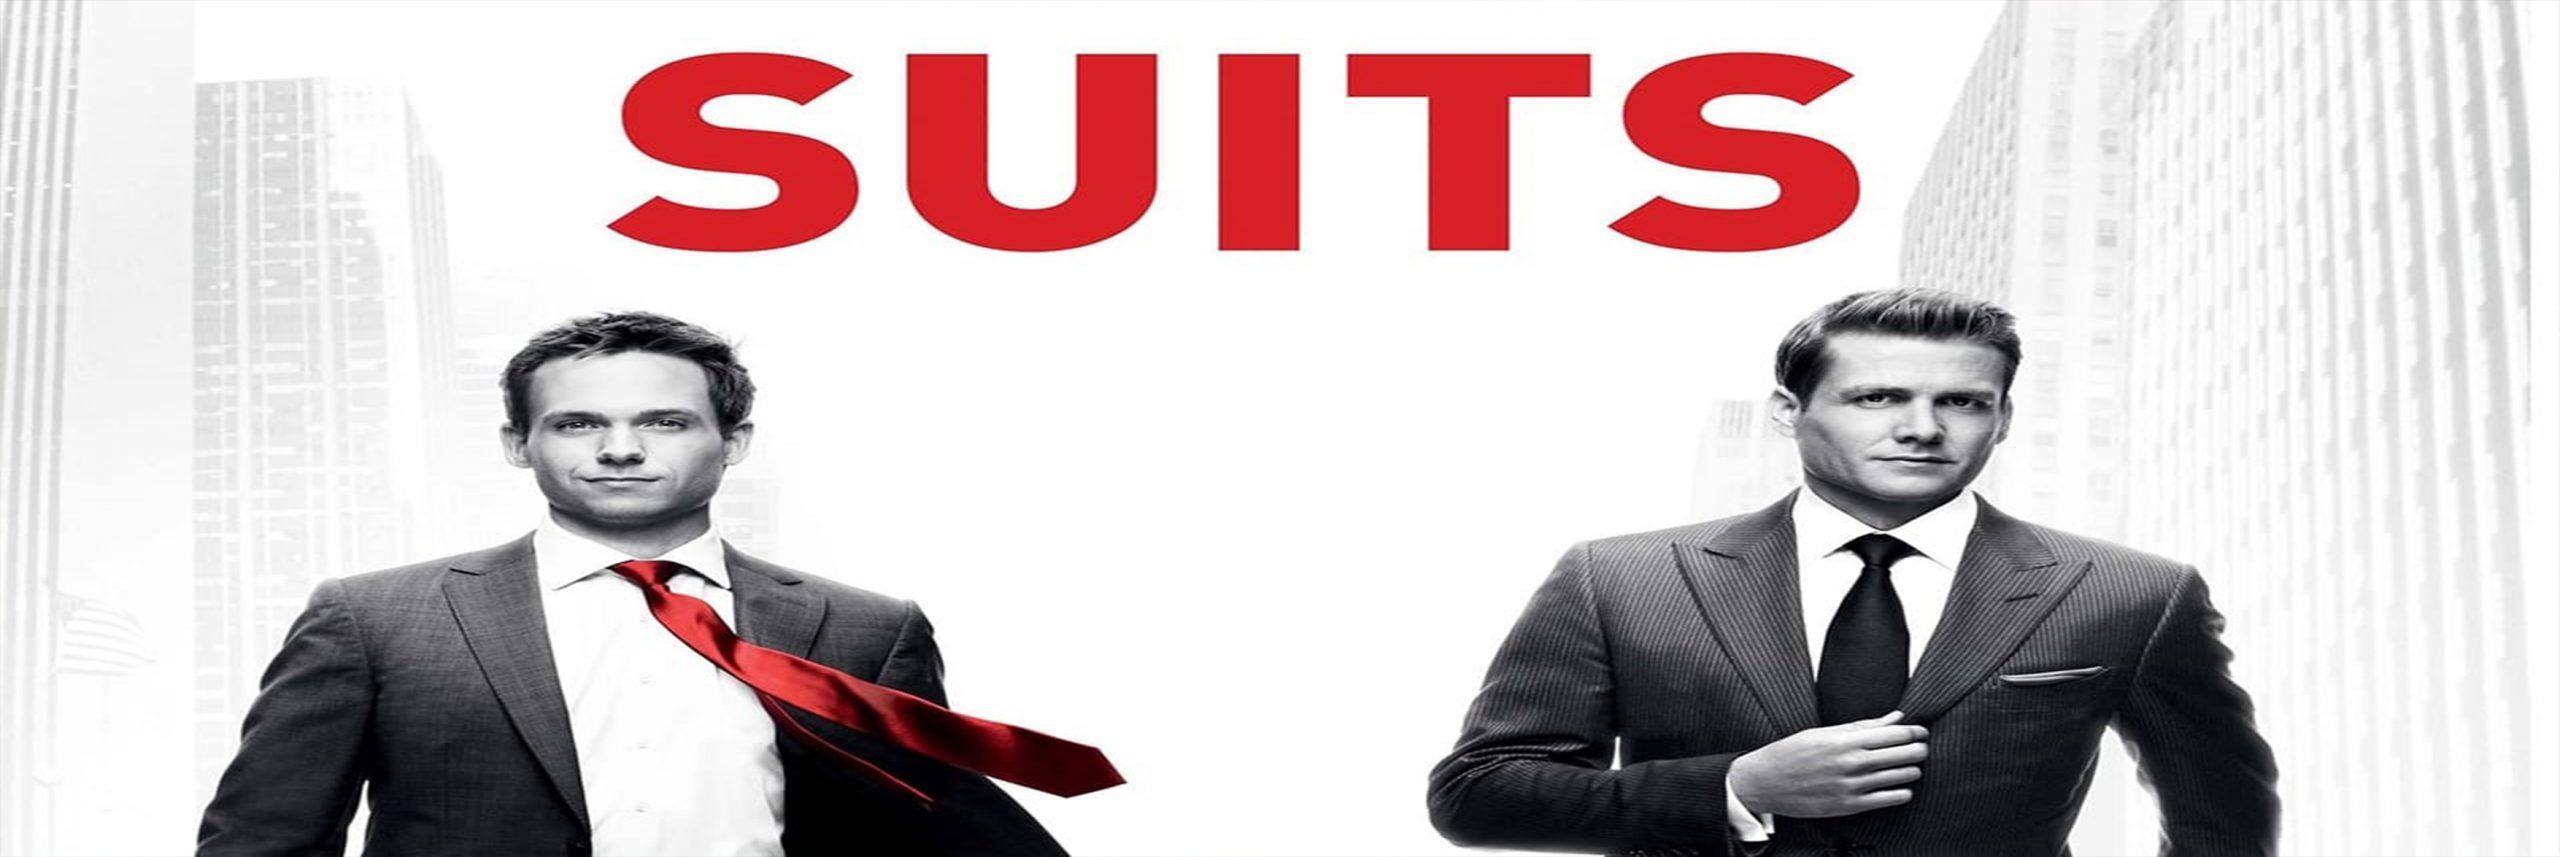 کت شلواری ها – Suits